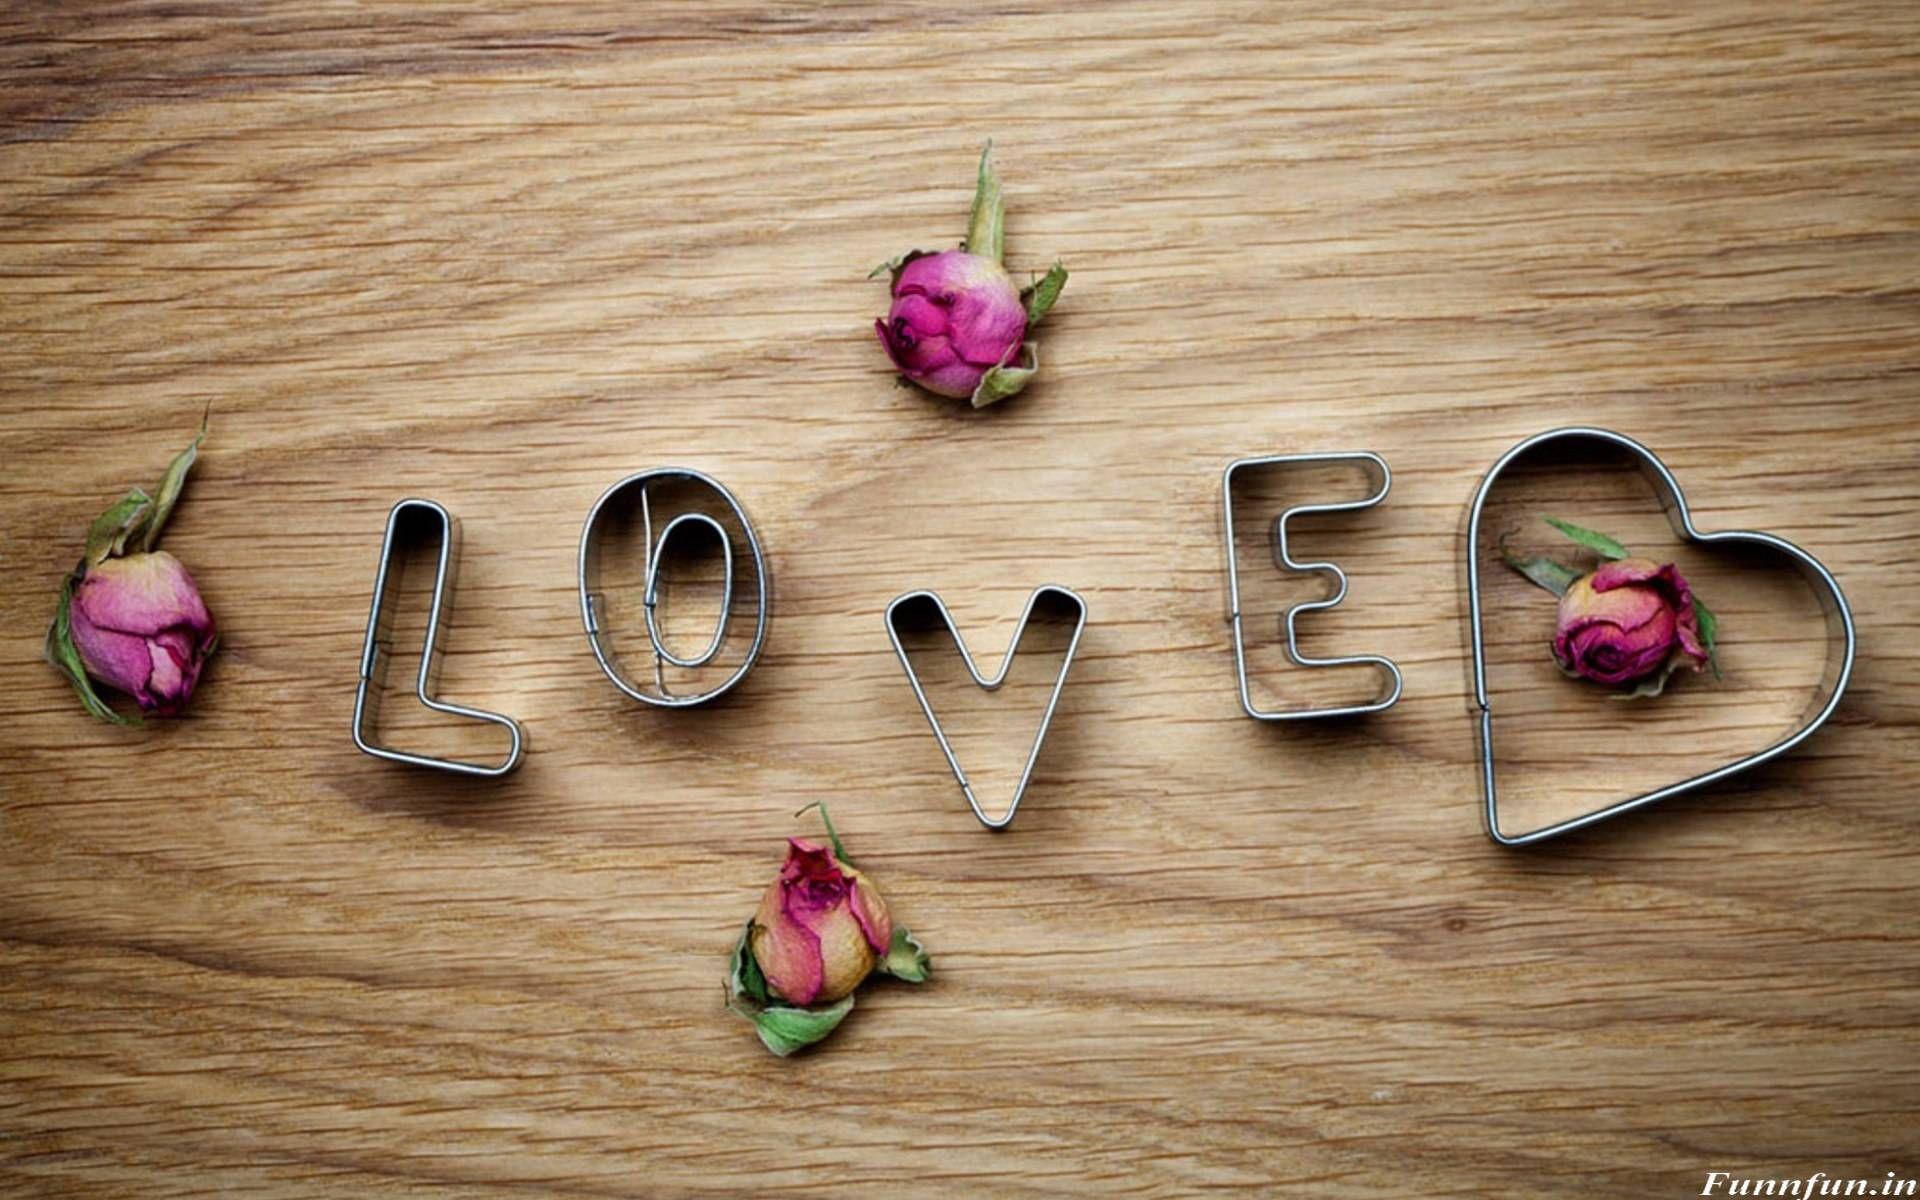 Hd wallpaper of love - Cute Love Wallpaper Full Hd Download Desktop Mobile Backgrounds